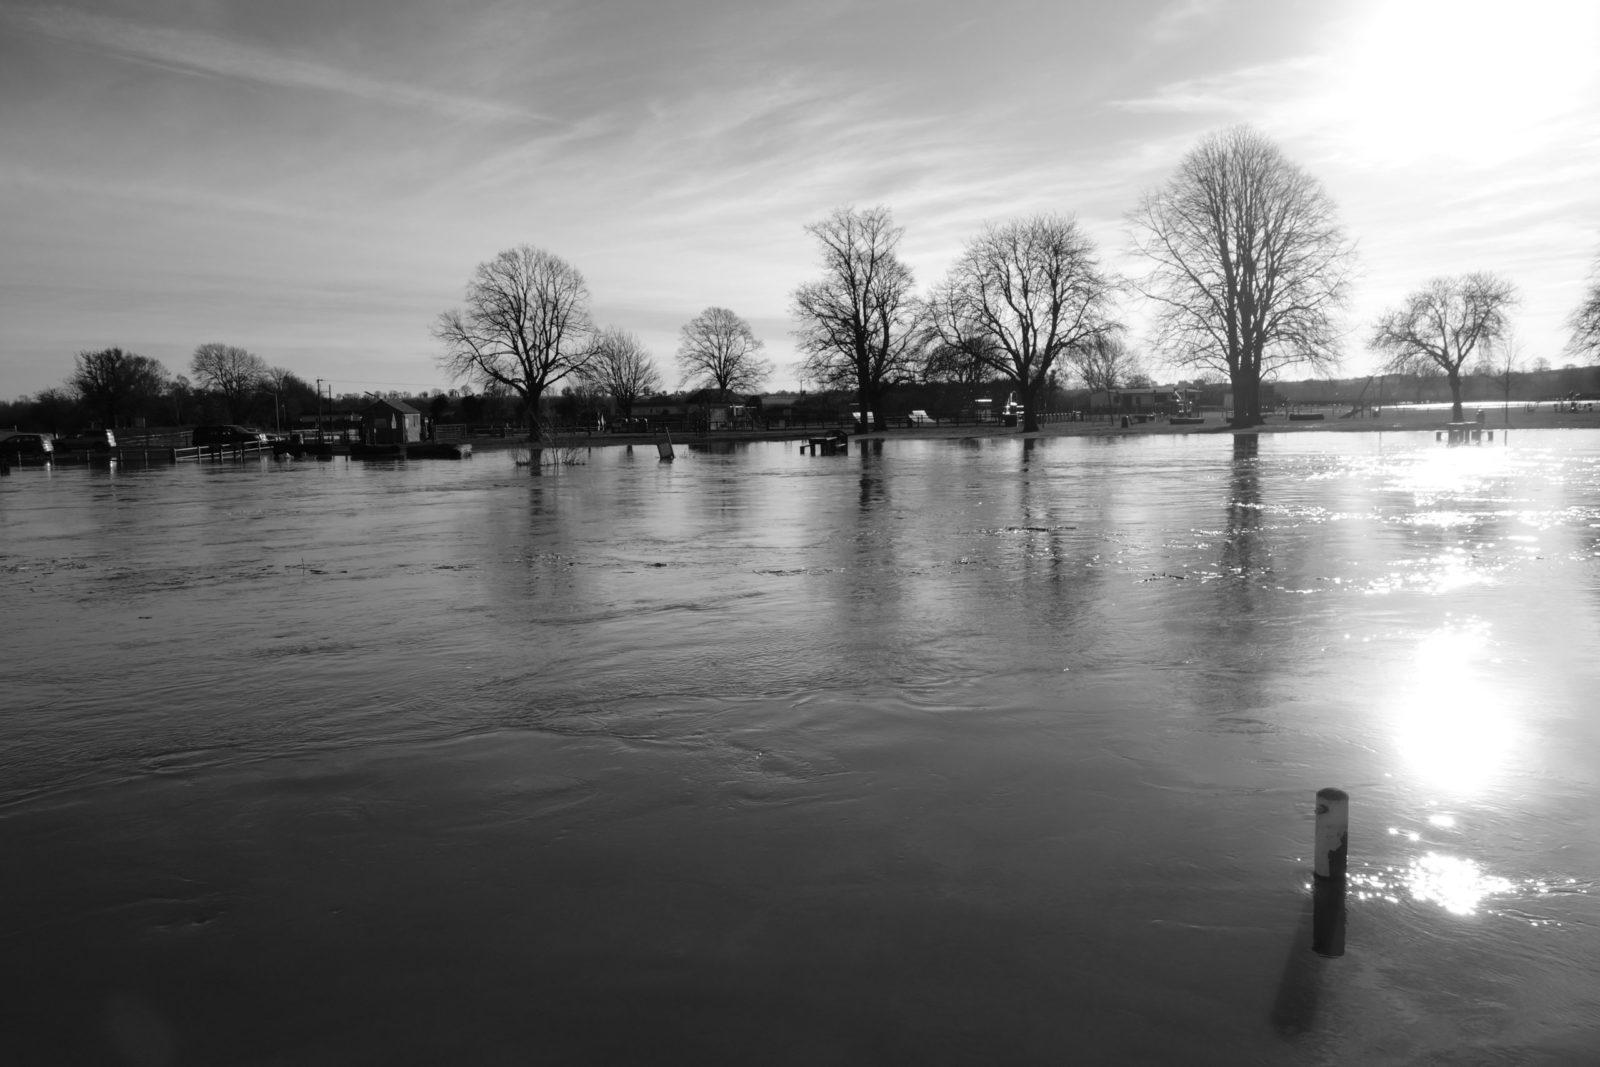 A flooded meadow in Warwickshire, England